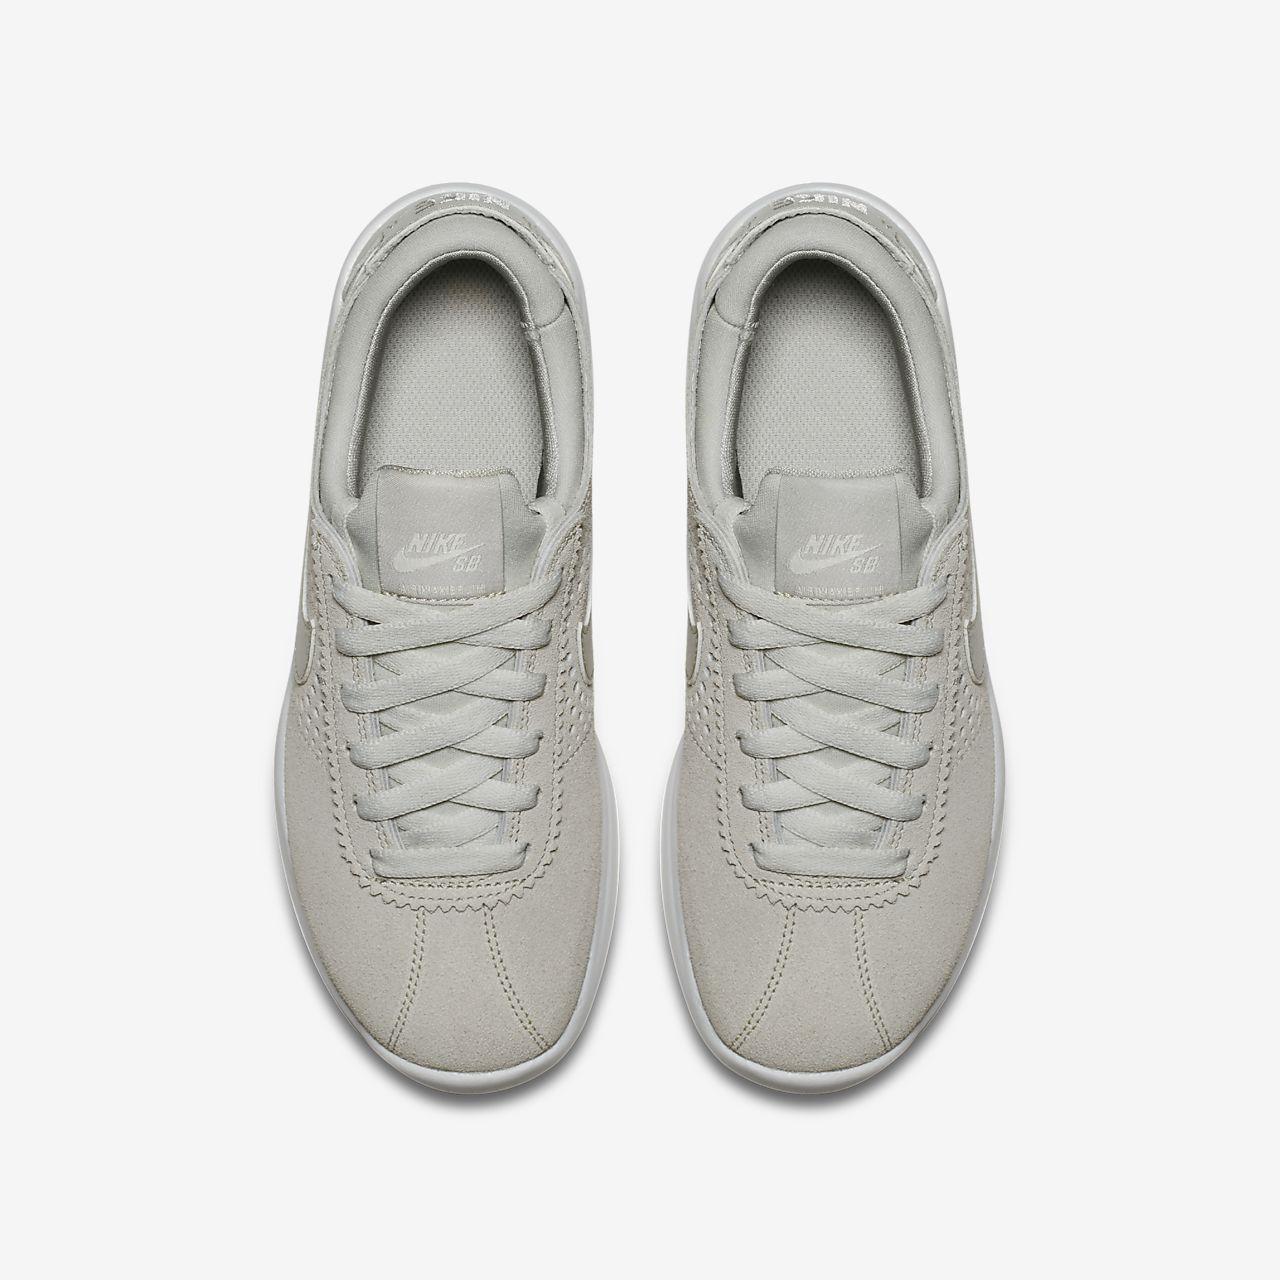 ... Nike SB Air Max Bruin Vapor Older Kids' Skateboarding Shoe